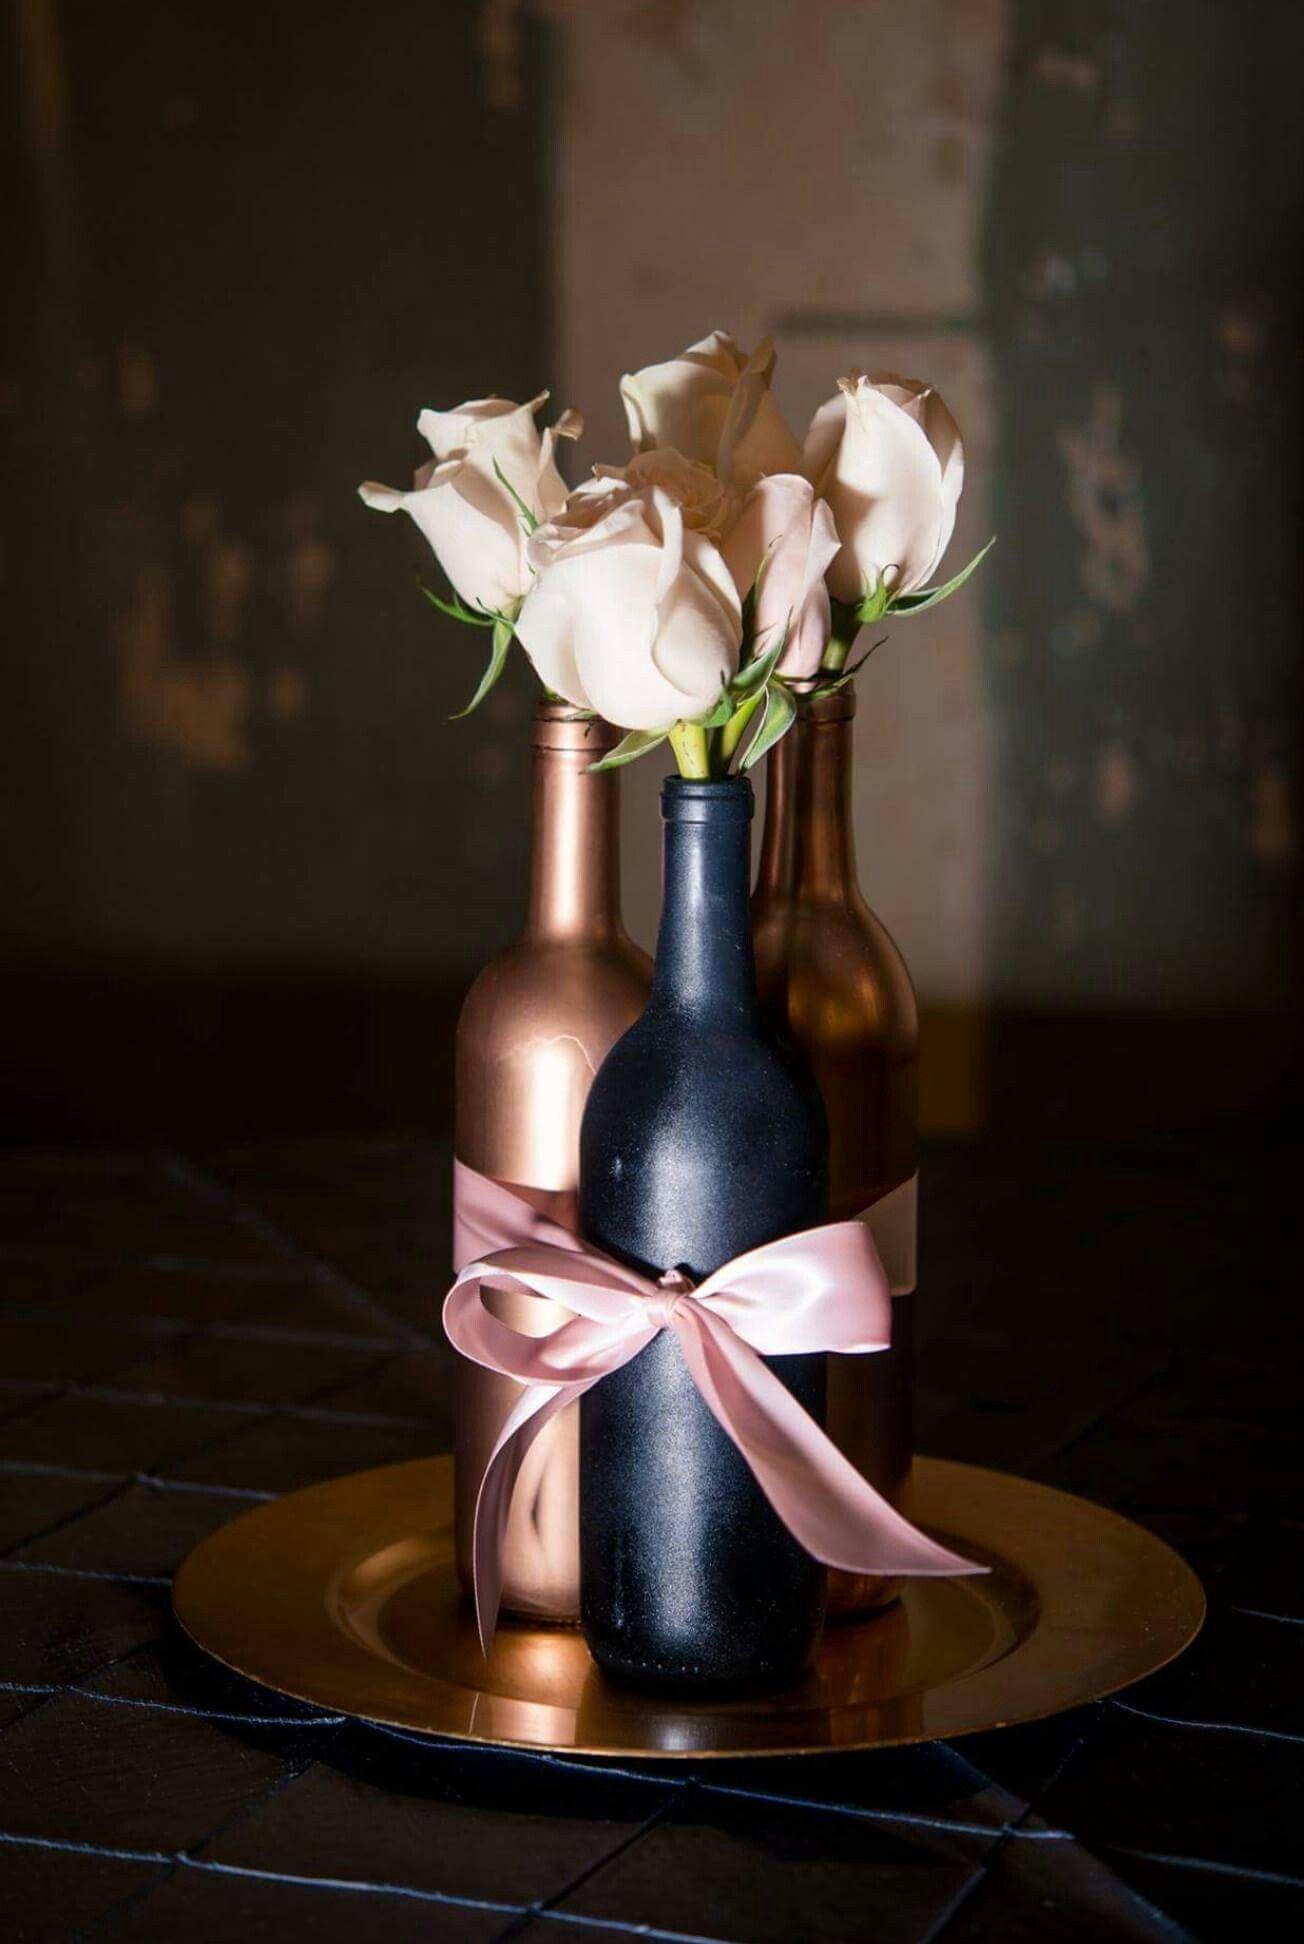 Designed By Bethany S Bouquets Wine Bottle Centerpiece For Wedding Roses Blush B Wine Bottle Wedding Centerpieces Bottle Centerpieces Wedding Wine Bottles